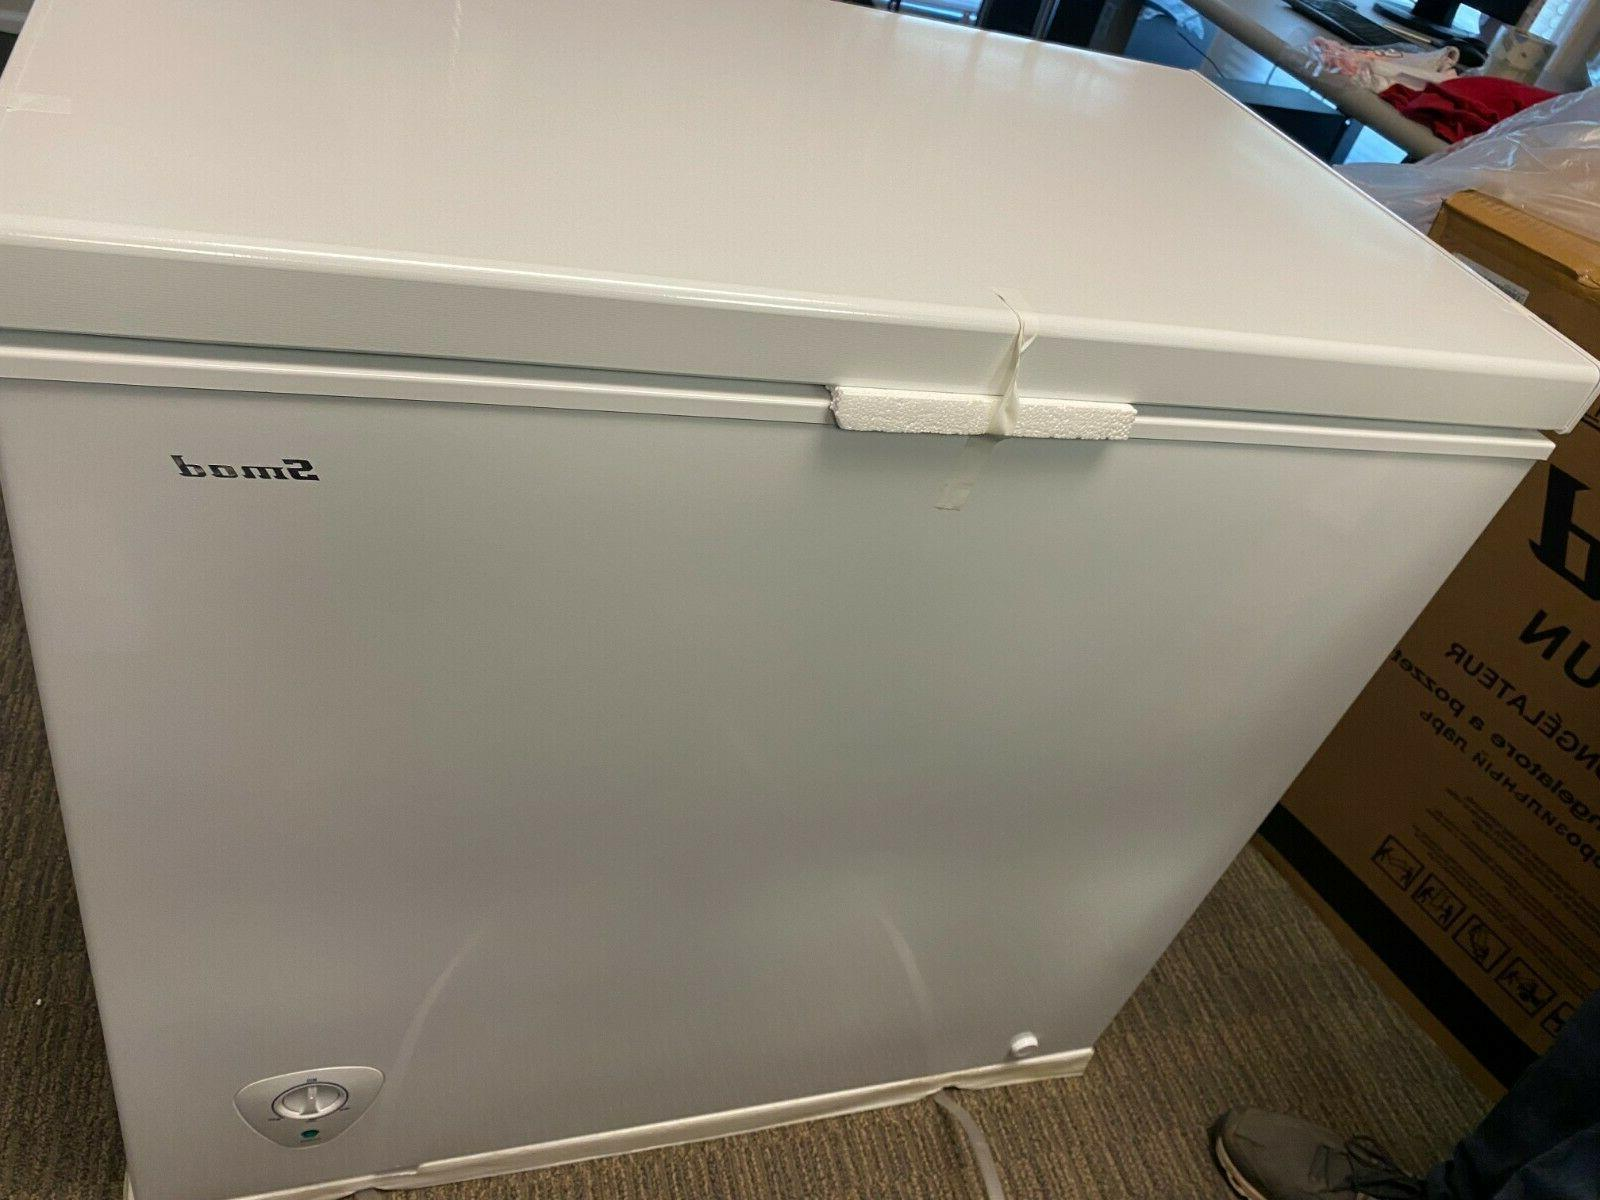 smeta 7 cu ft chest freezer whie